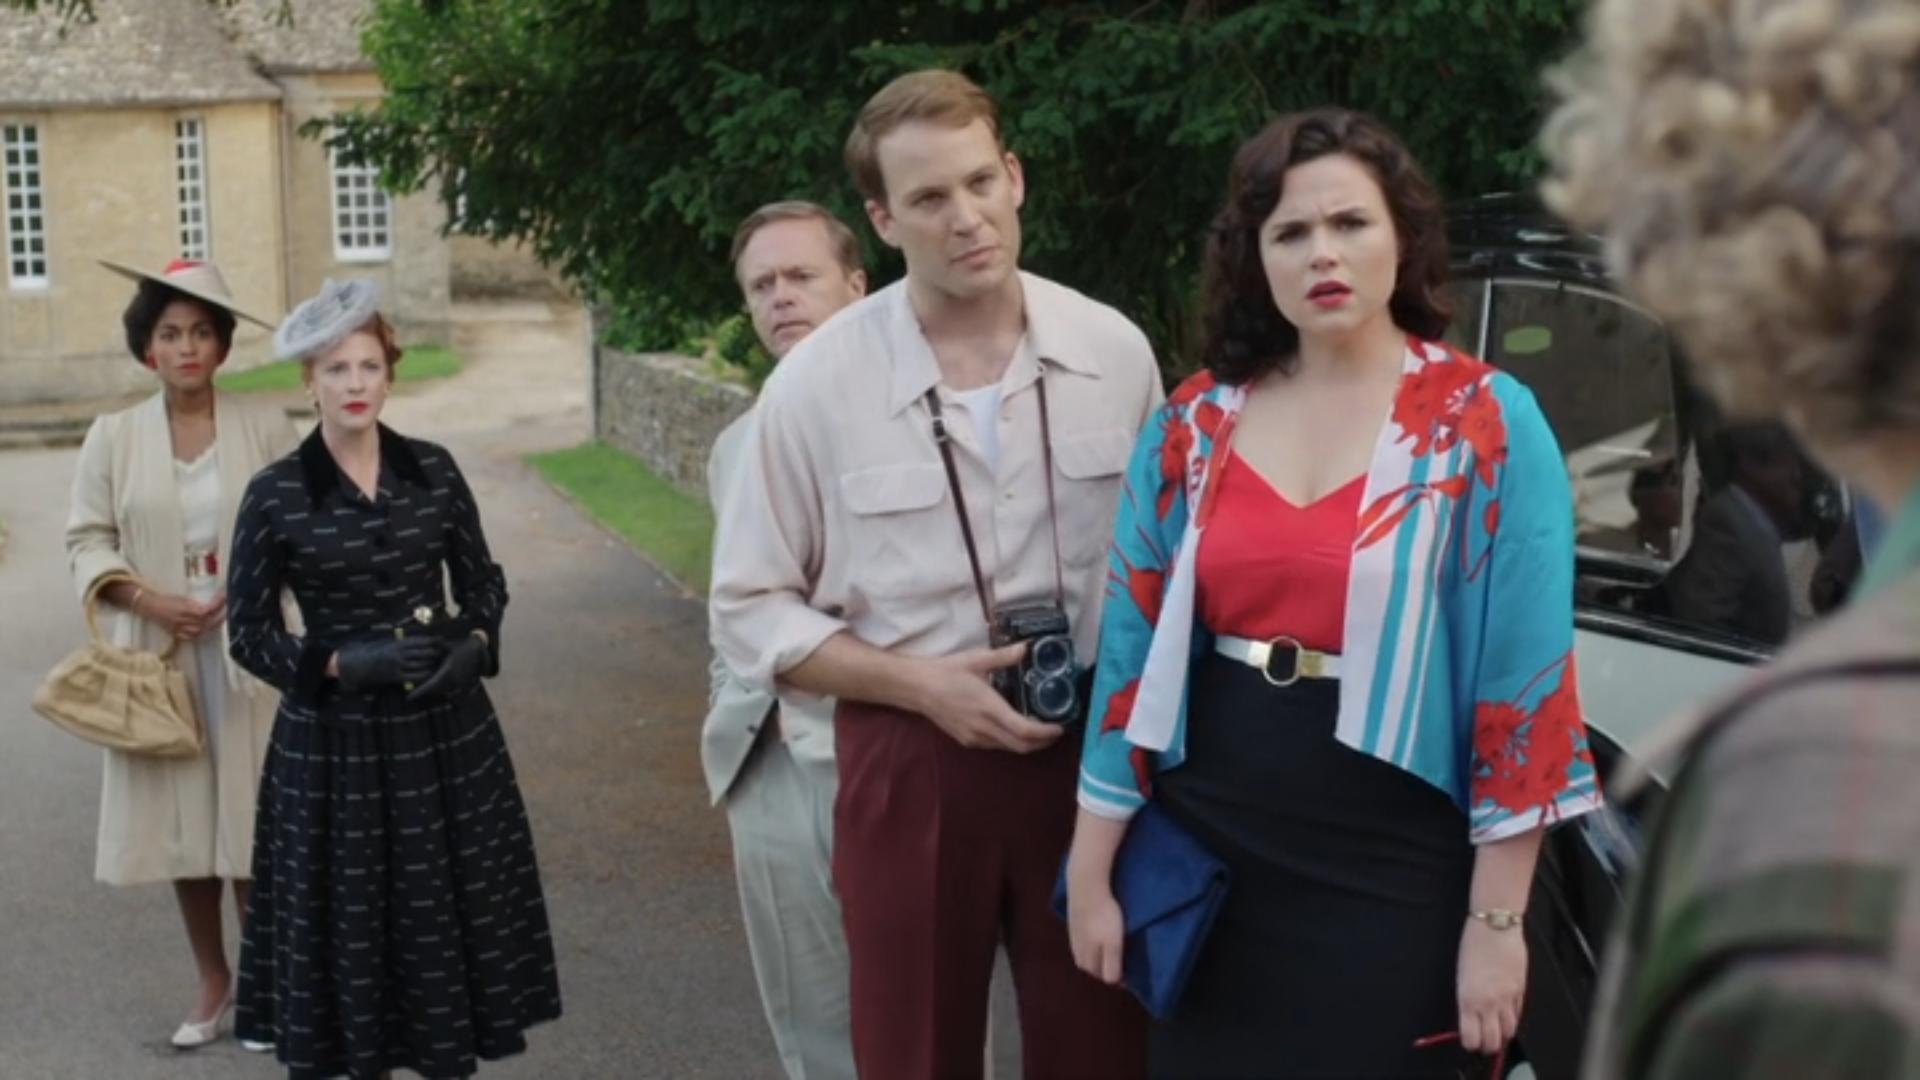 Nick Waring, Ingvild Lakou, Rosalie Craig, Emer Kenny, and Ben Lamb in The Fall of the House of St Gardner (2020)